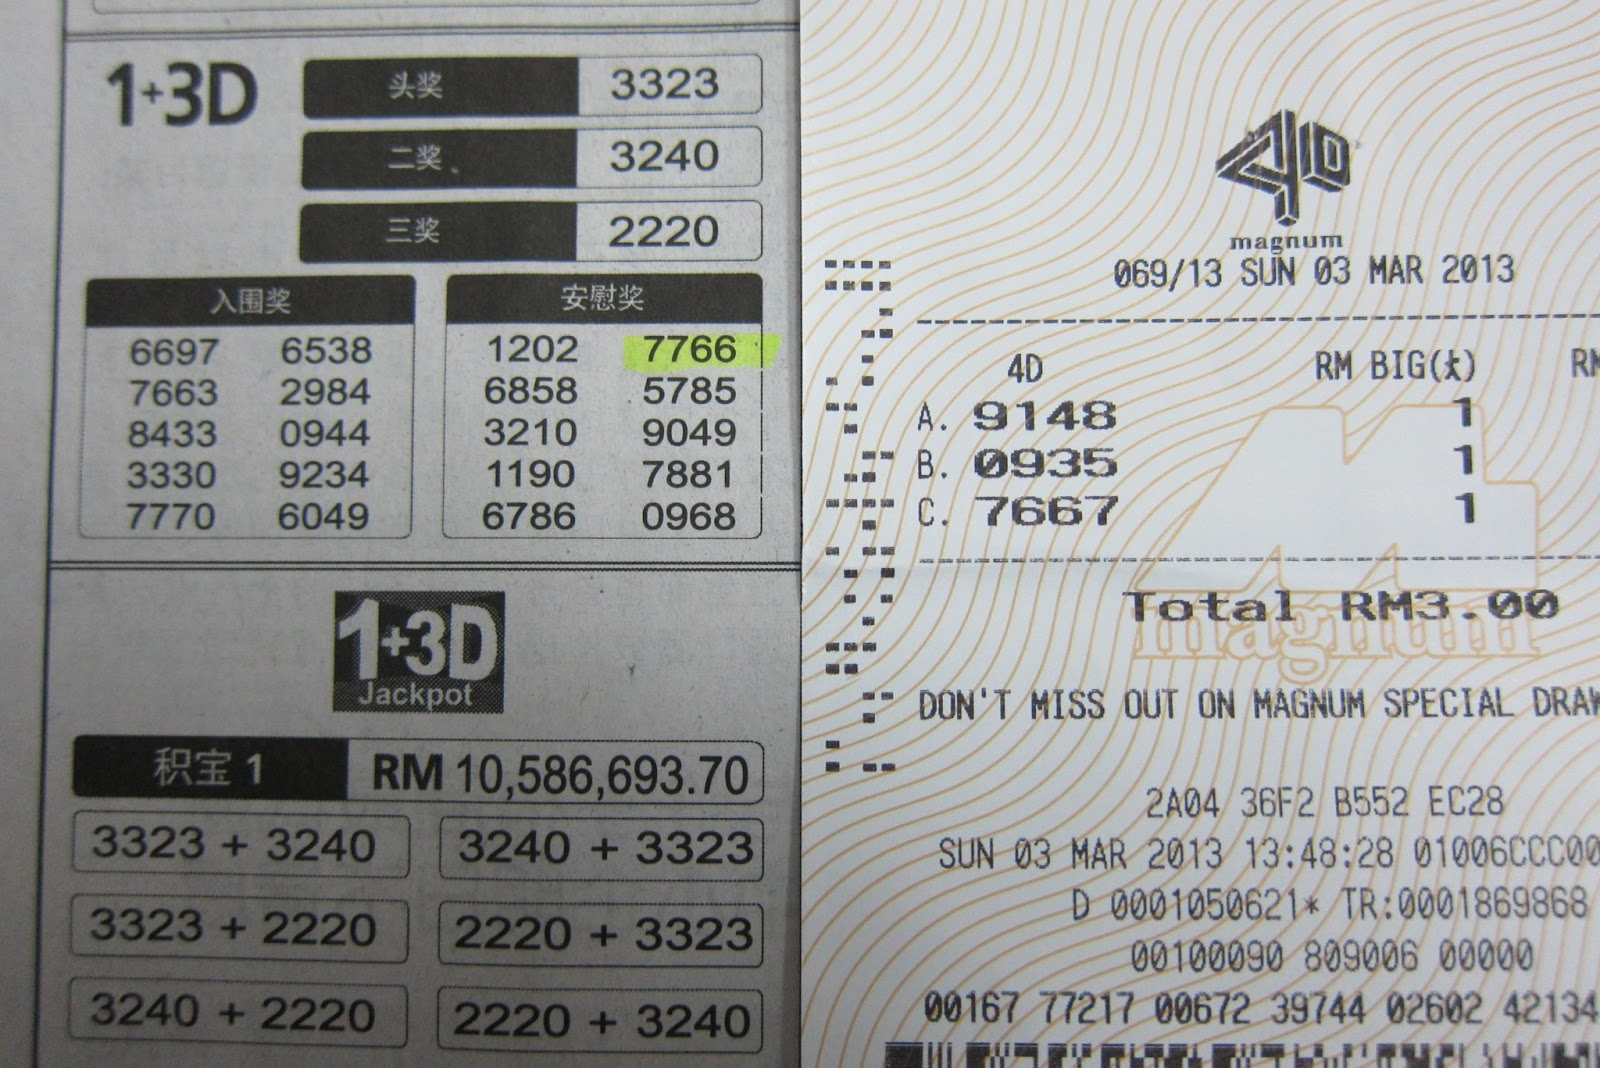 On Mar 2, we win Damacai second prize 9656 | Winning 4D Power ...